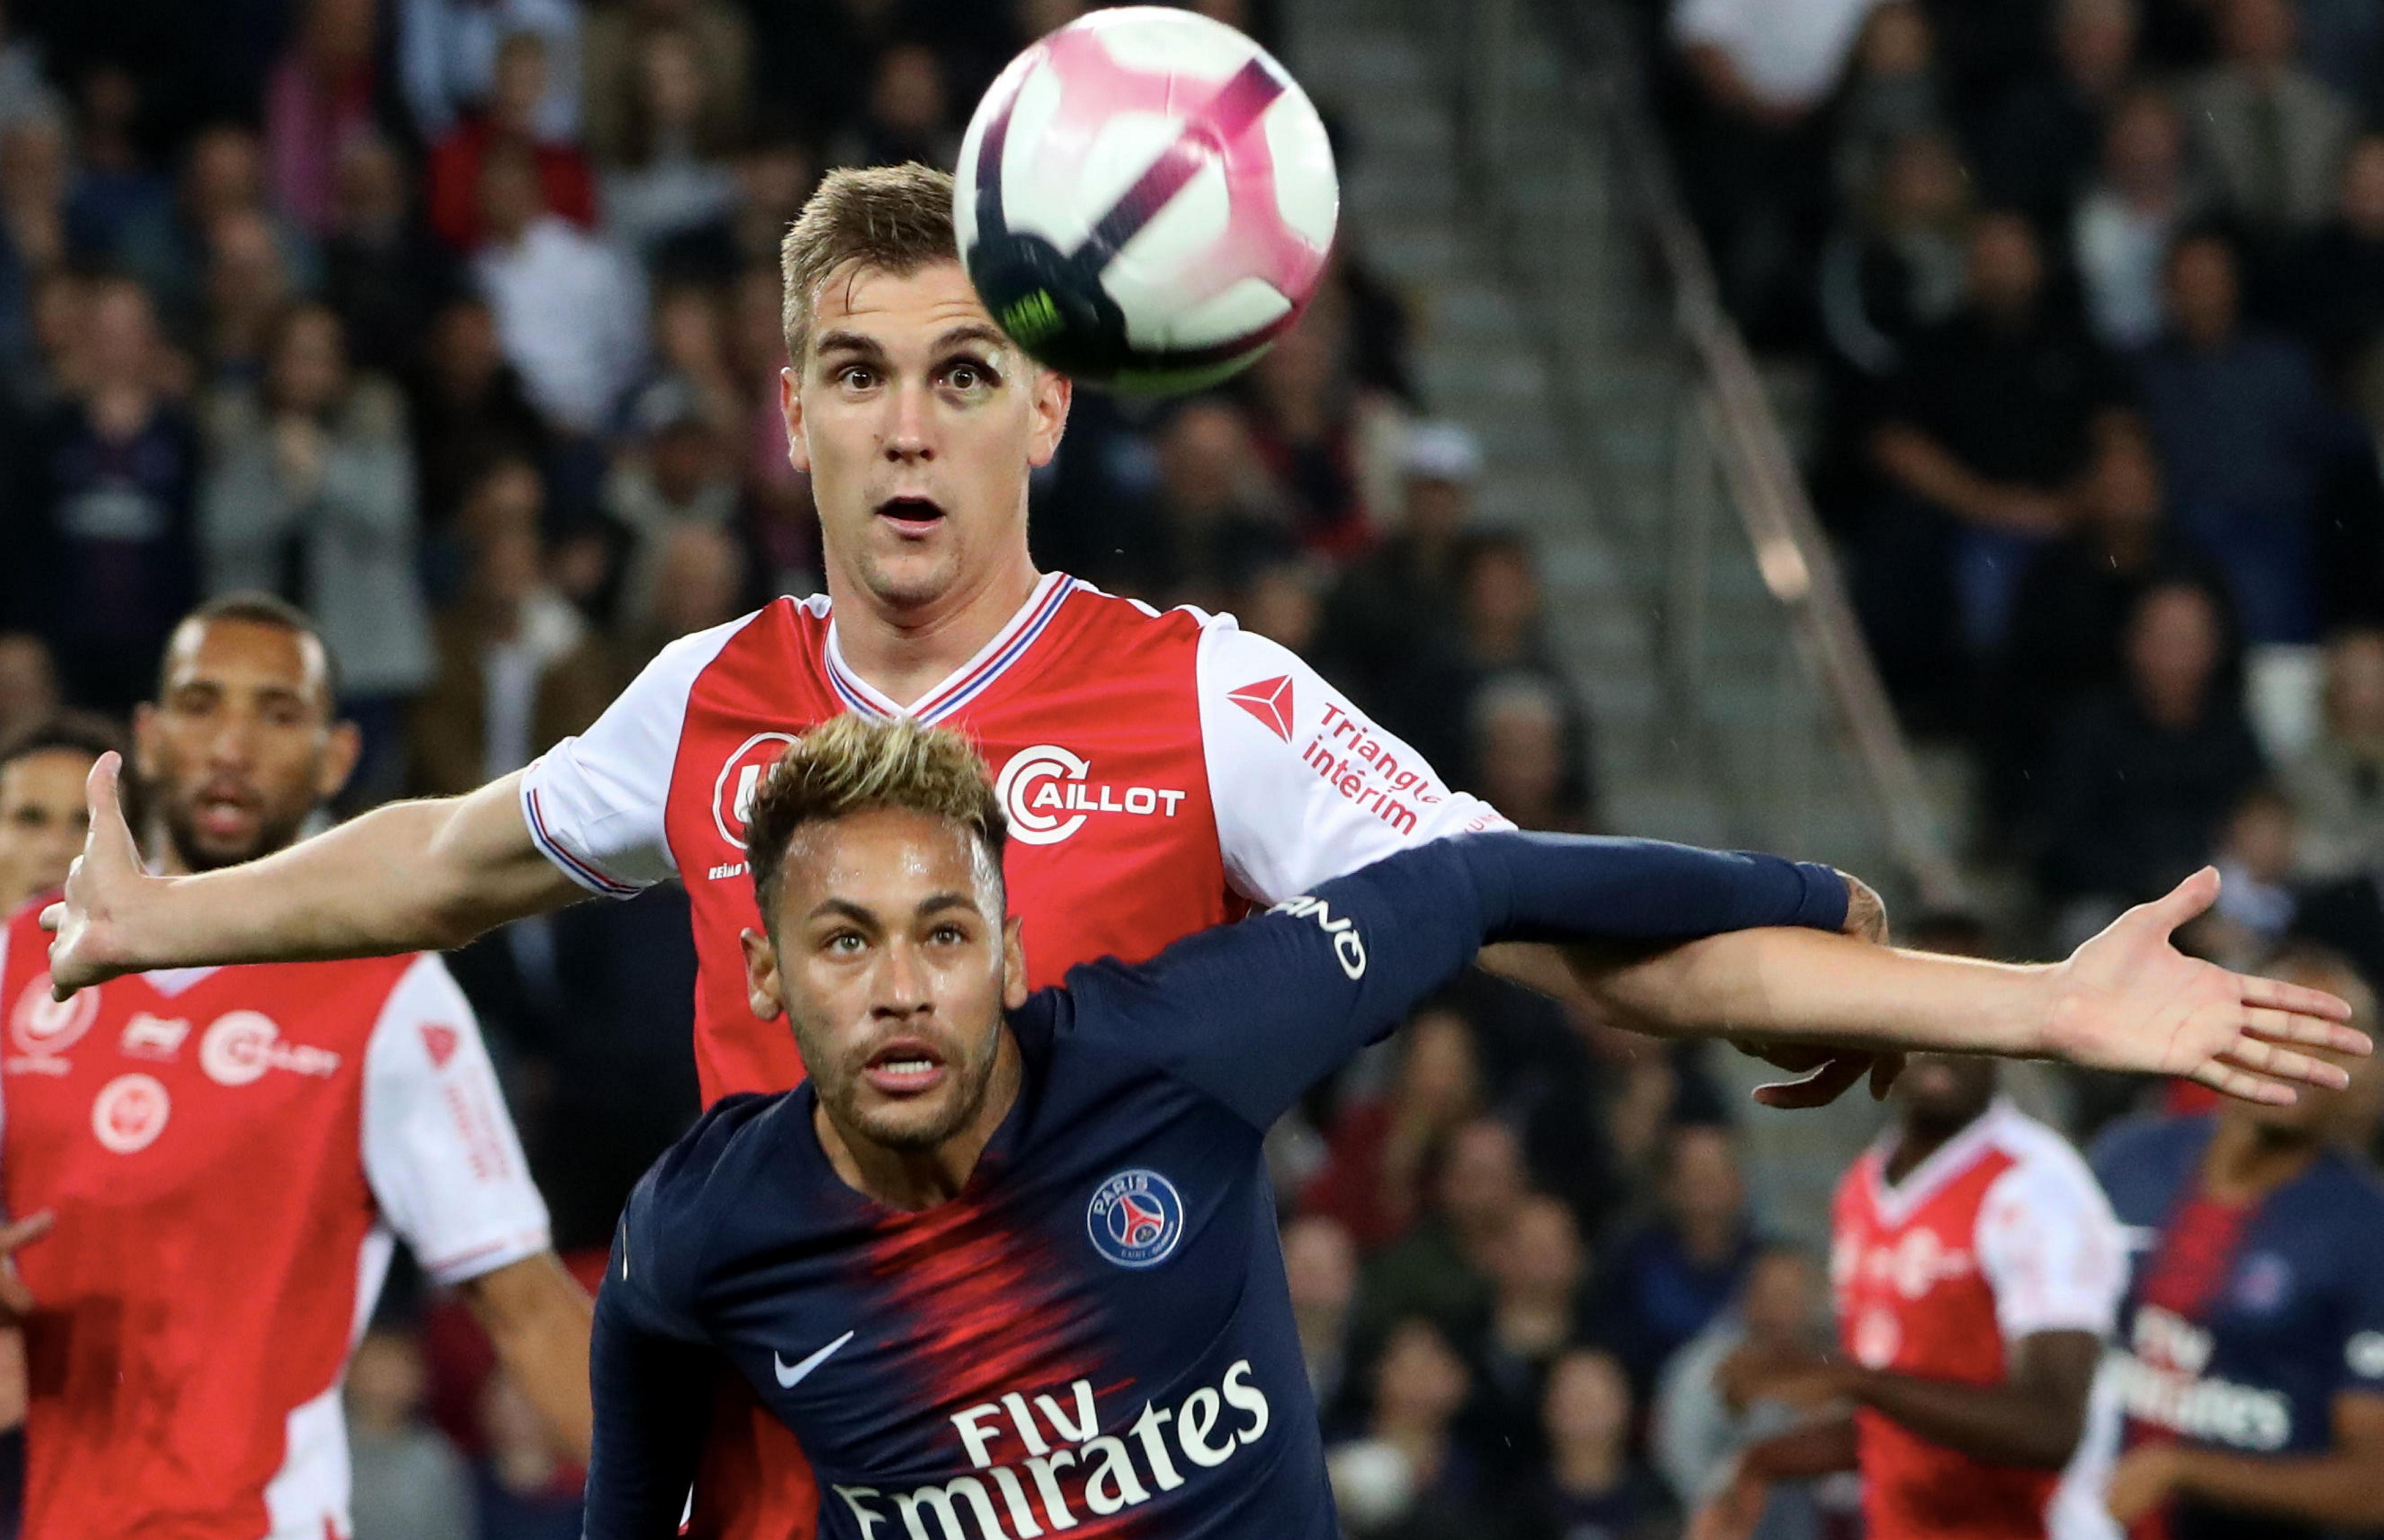 Paris Saint-Germain v Stade Reims - Ligue 1